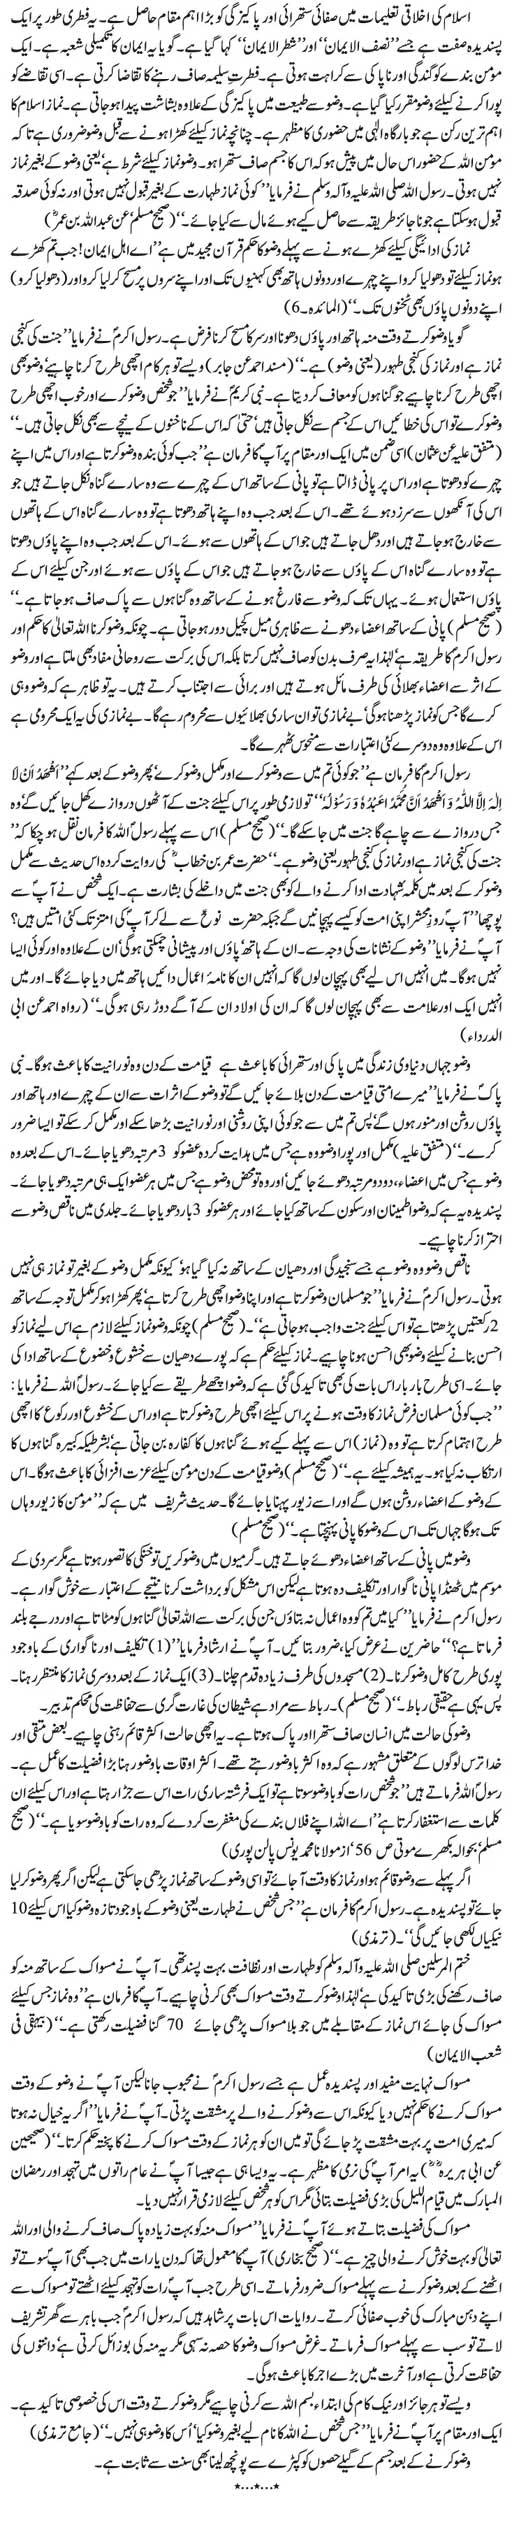 Wudu Kay Fazail Aur Adaab